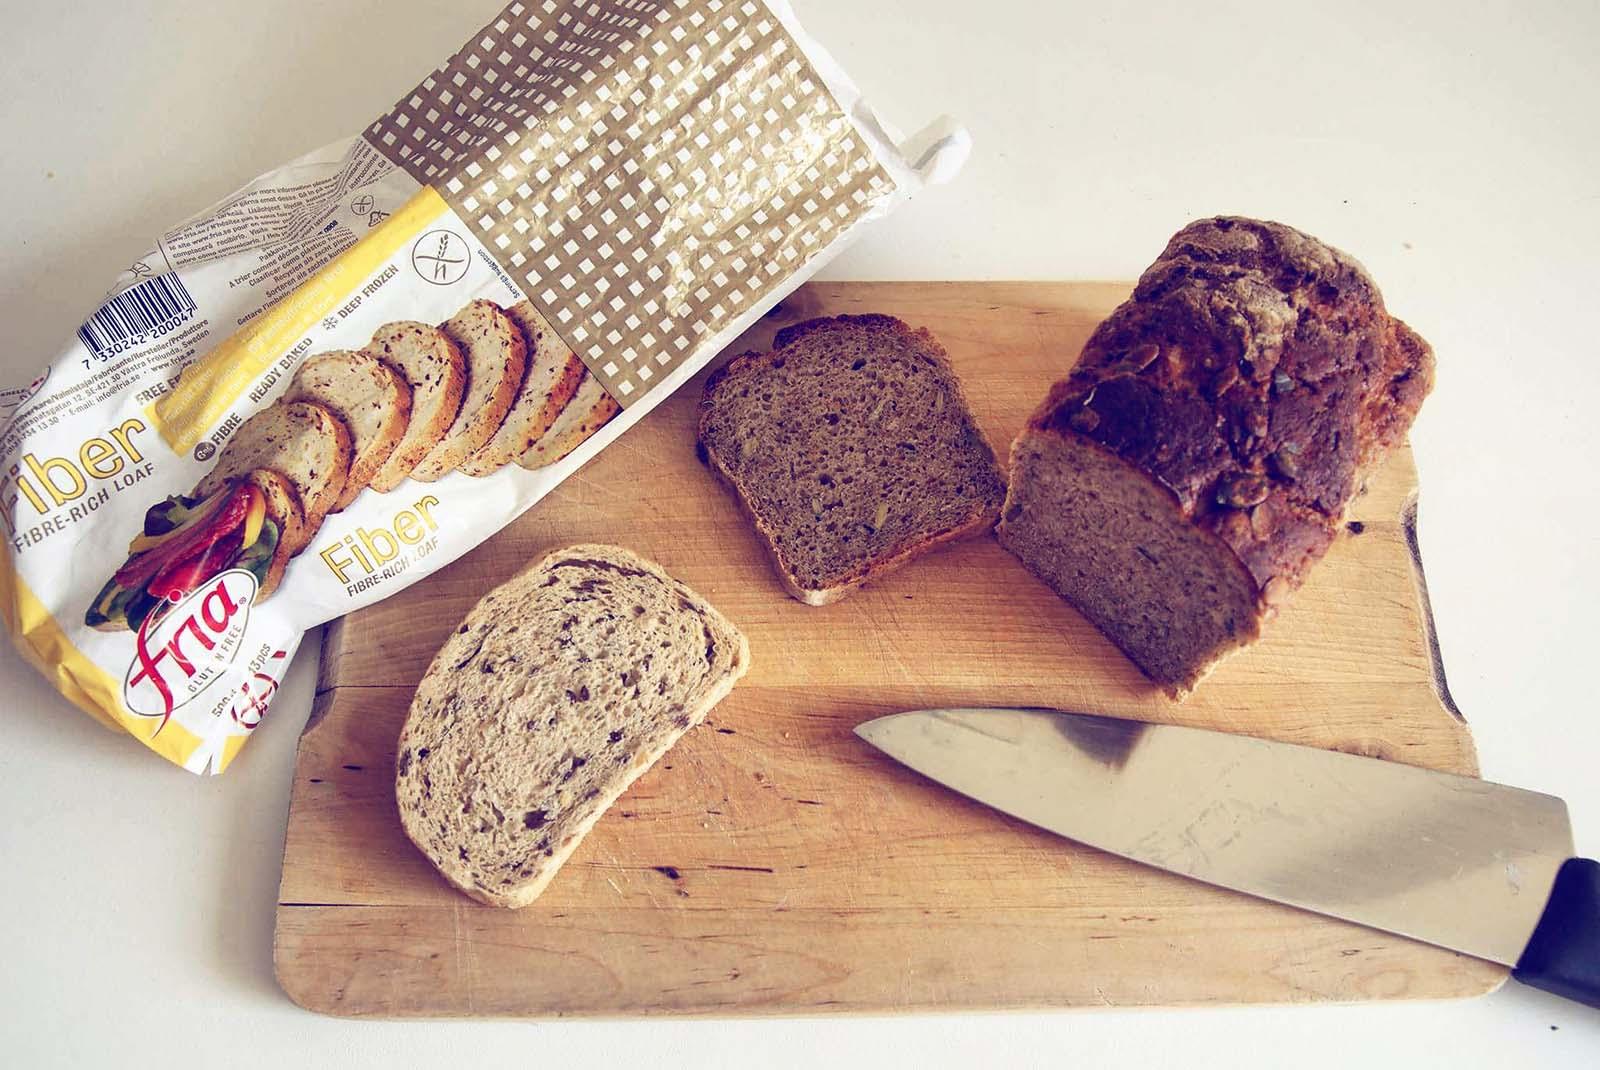 Chleb bezglutenowy na desce do krojenia